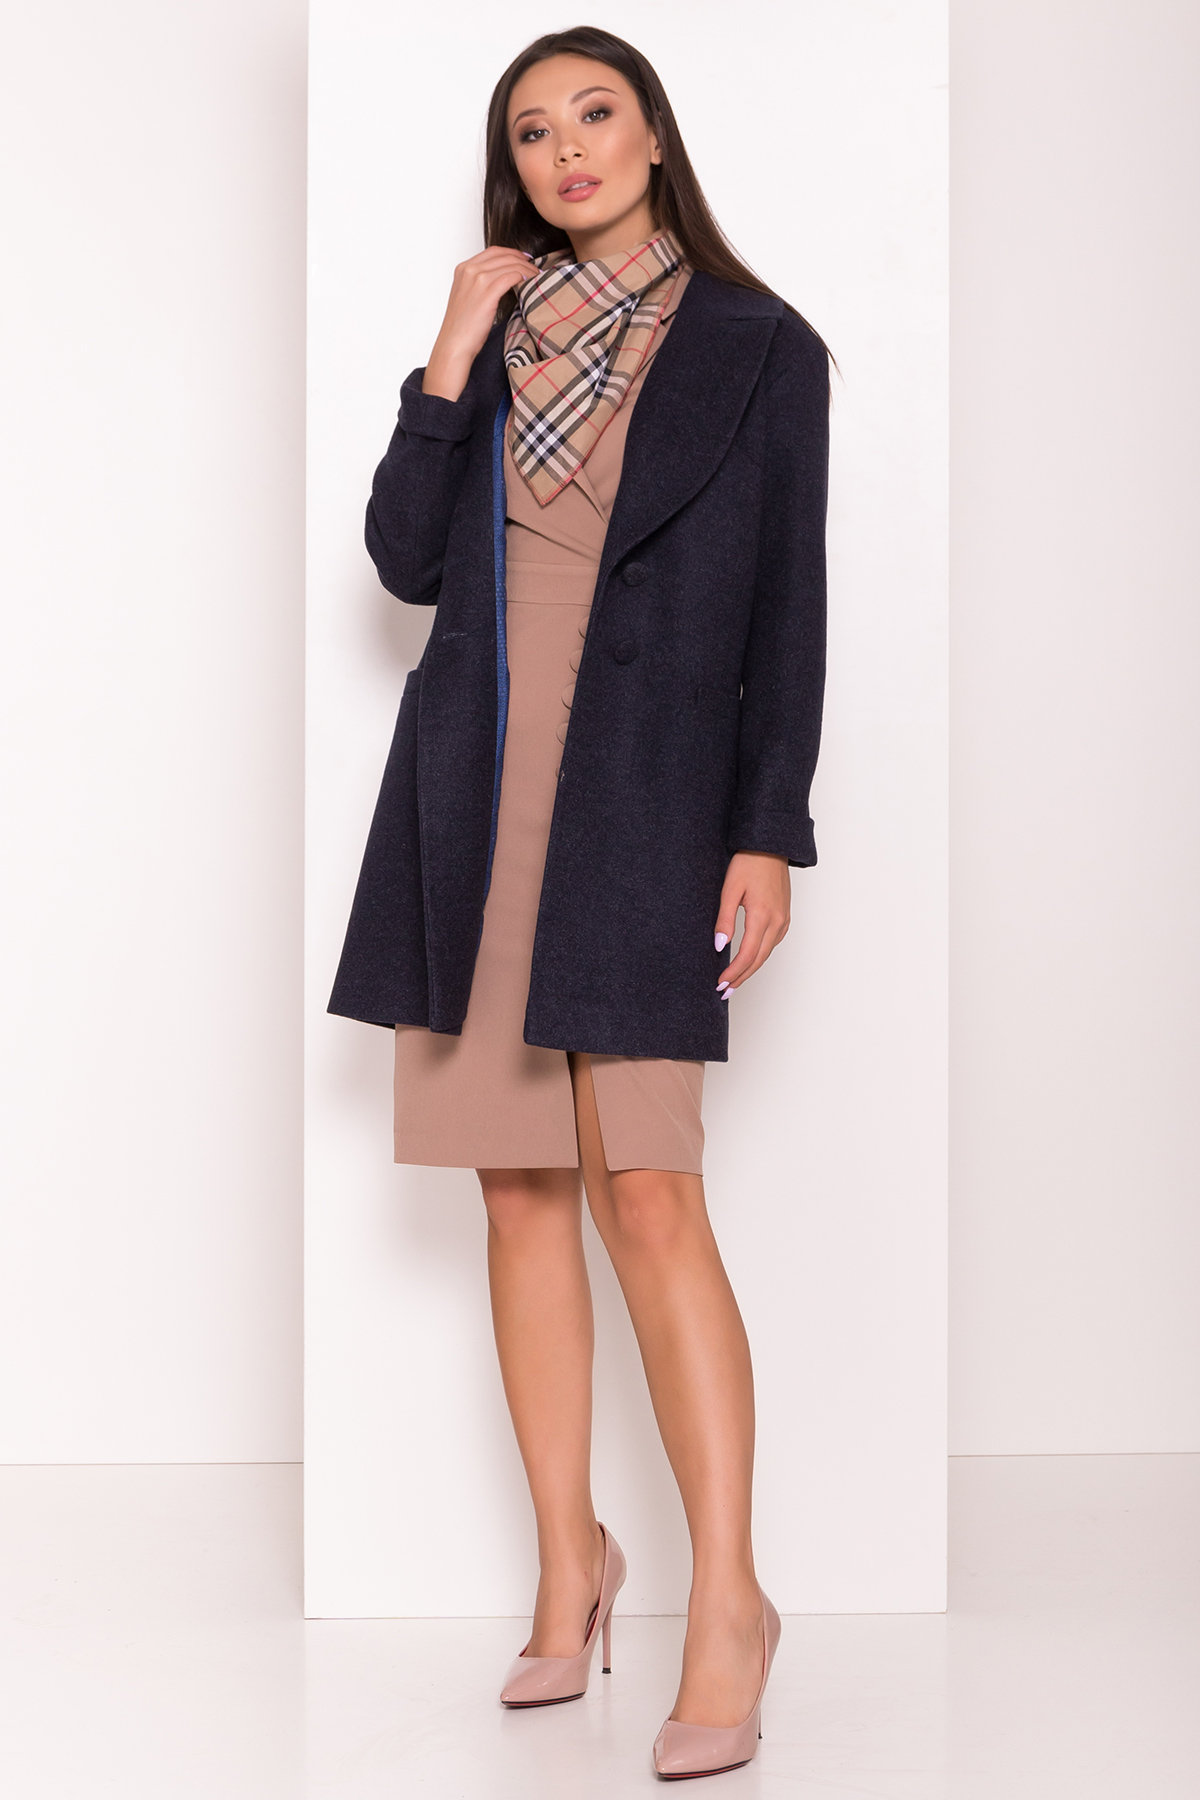 Пальто Вива 7868 АРТ. 43782 Цвет: Темно-синий 6 - фото 3, интернет магазин tm-modus.ru